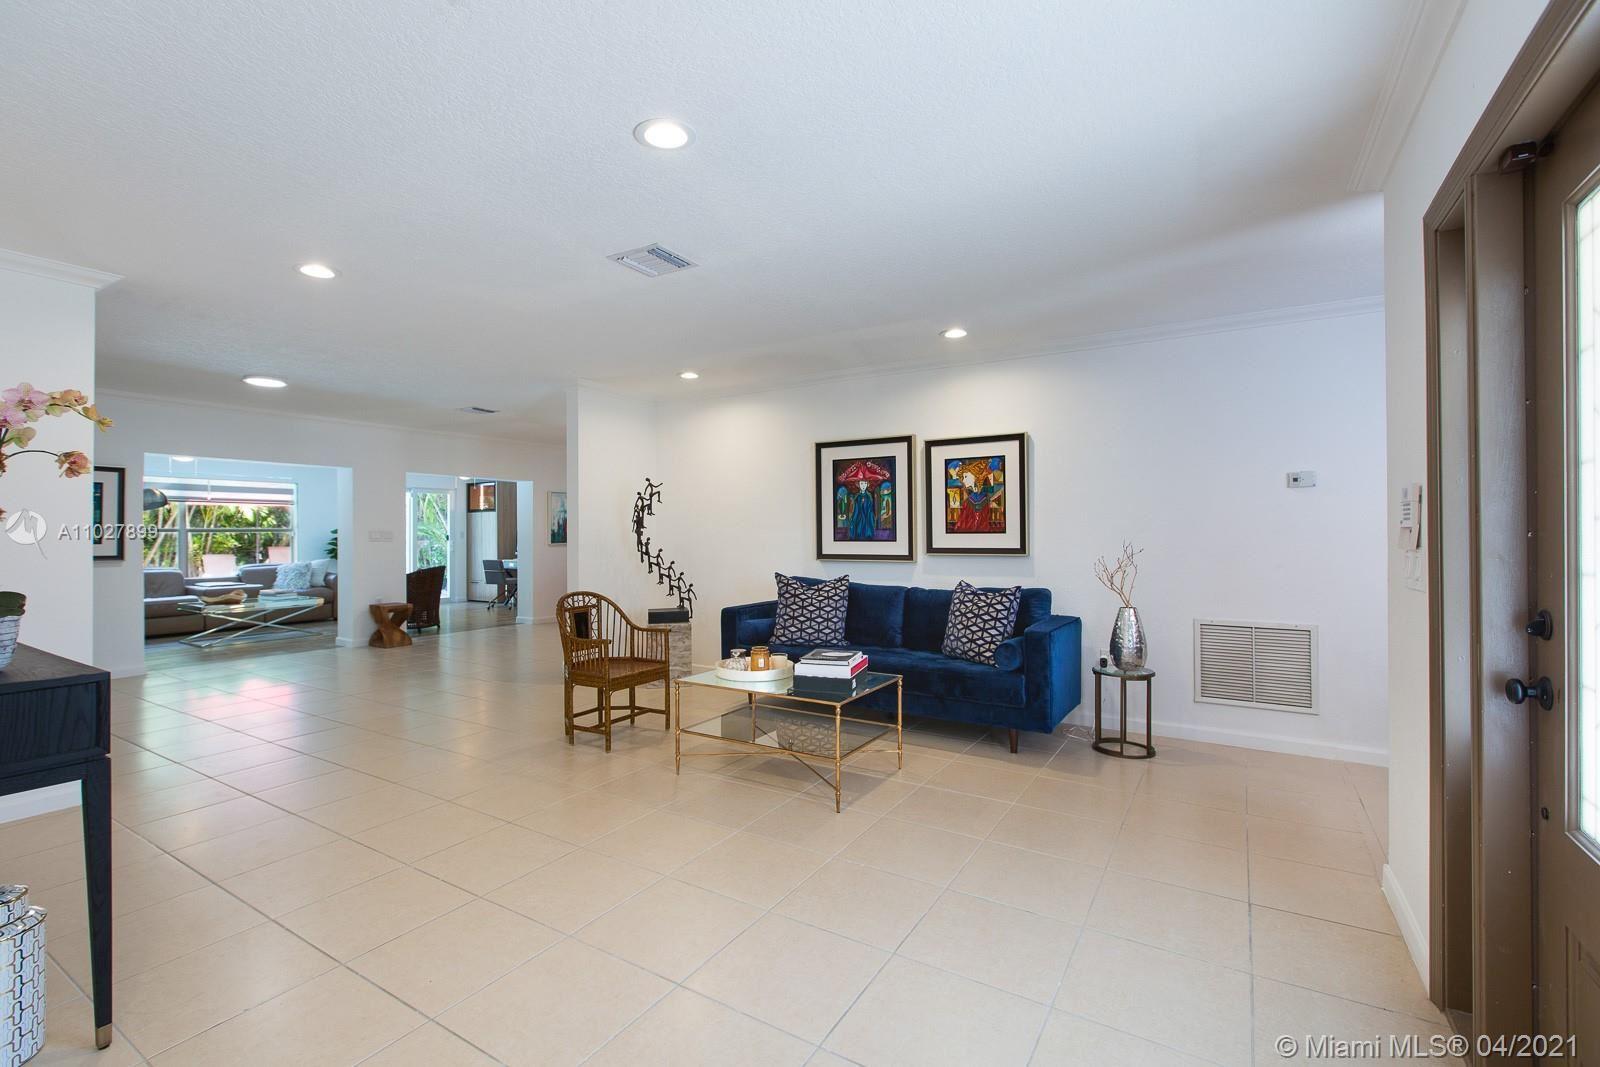 Photo of 5810 Leonardo St, Coral Gables, FL 33146 (MLS # A11027899)